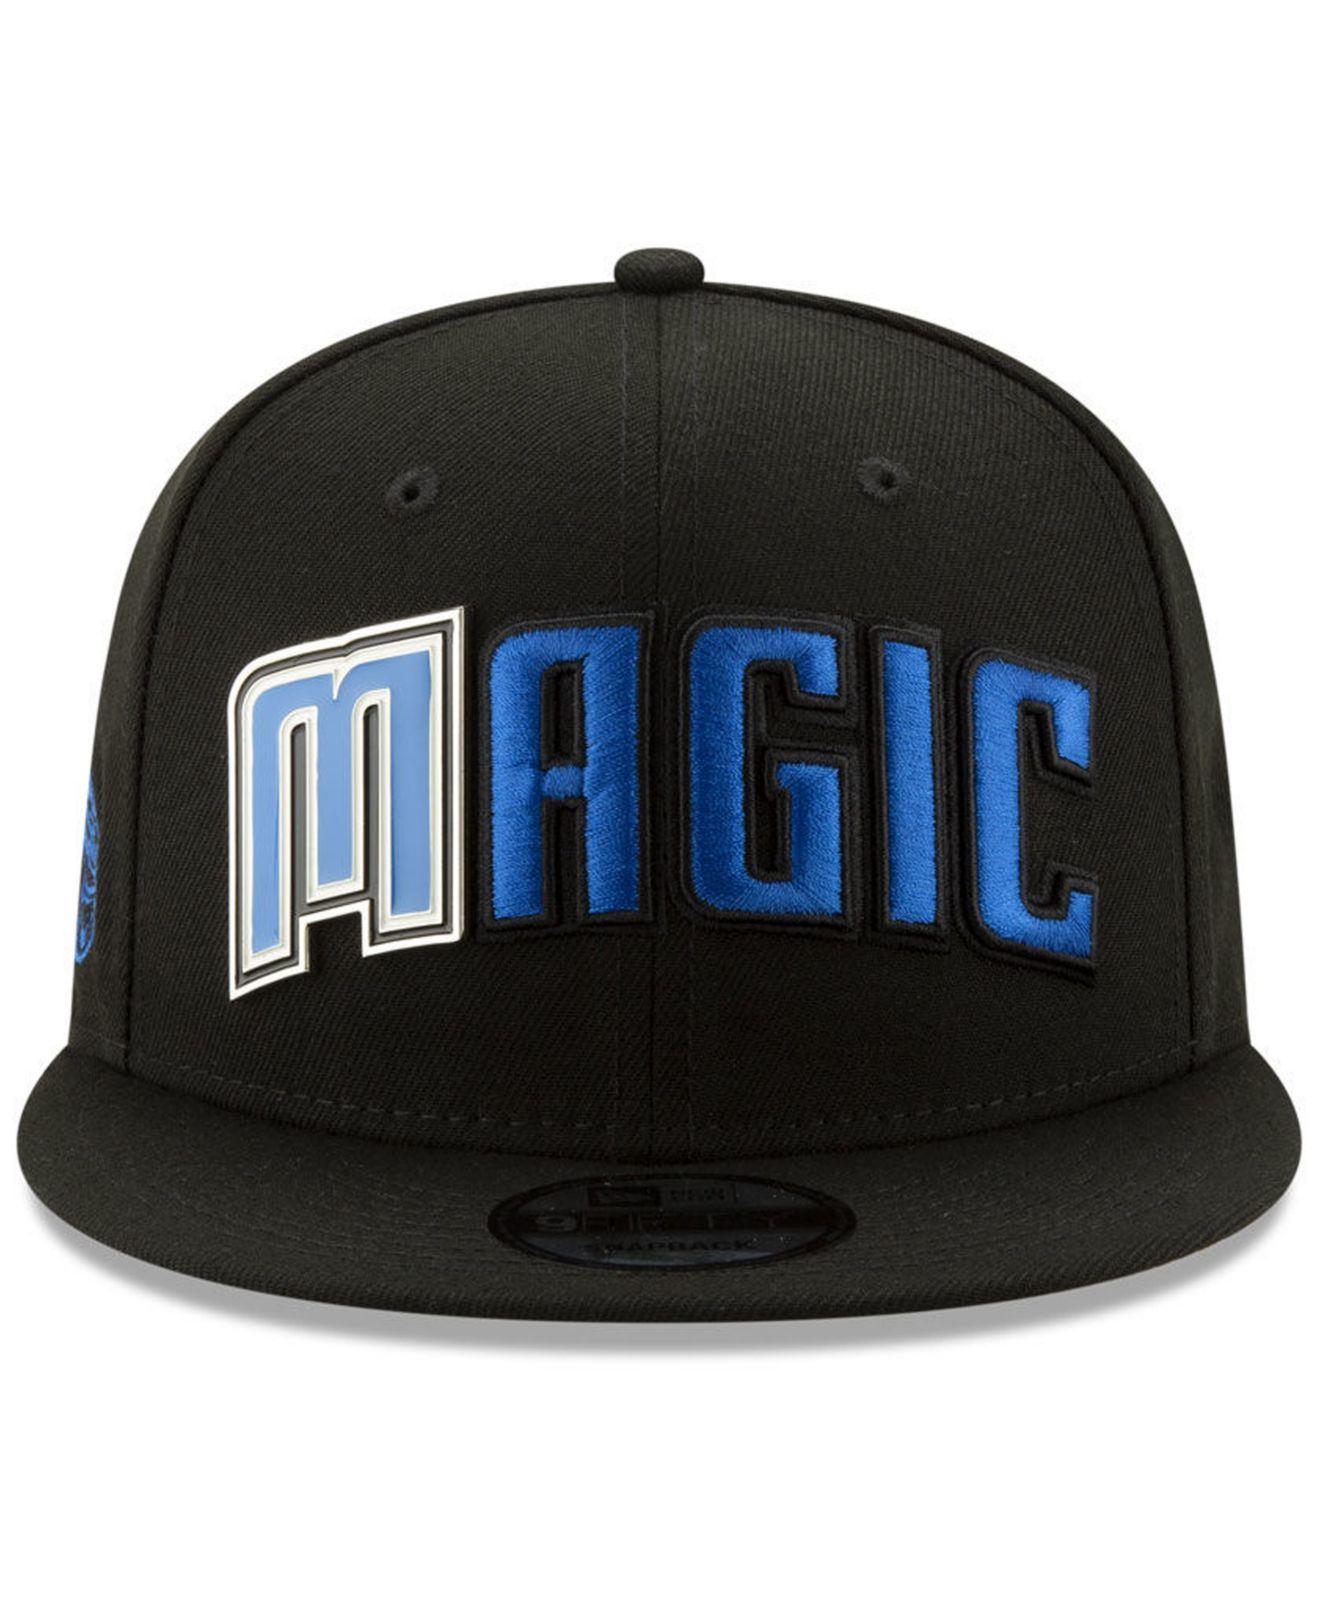 reputable site 1bc79 9ad9f Lyst - KTZ Orlando Magic Enamel Script 9fifty Snapback Cap in Black for Men